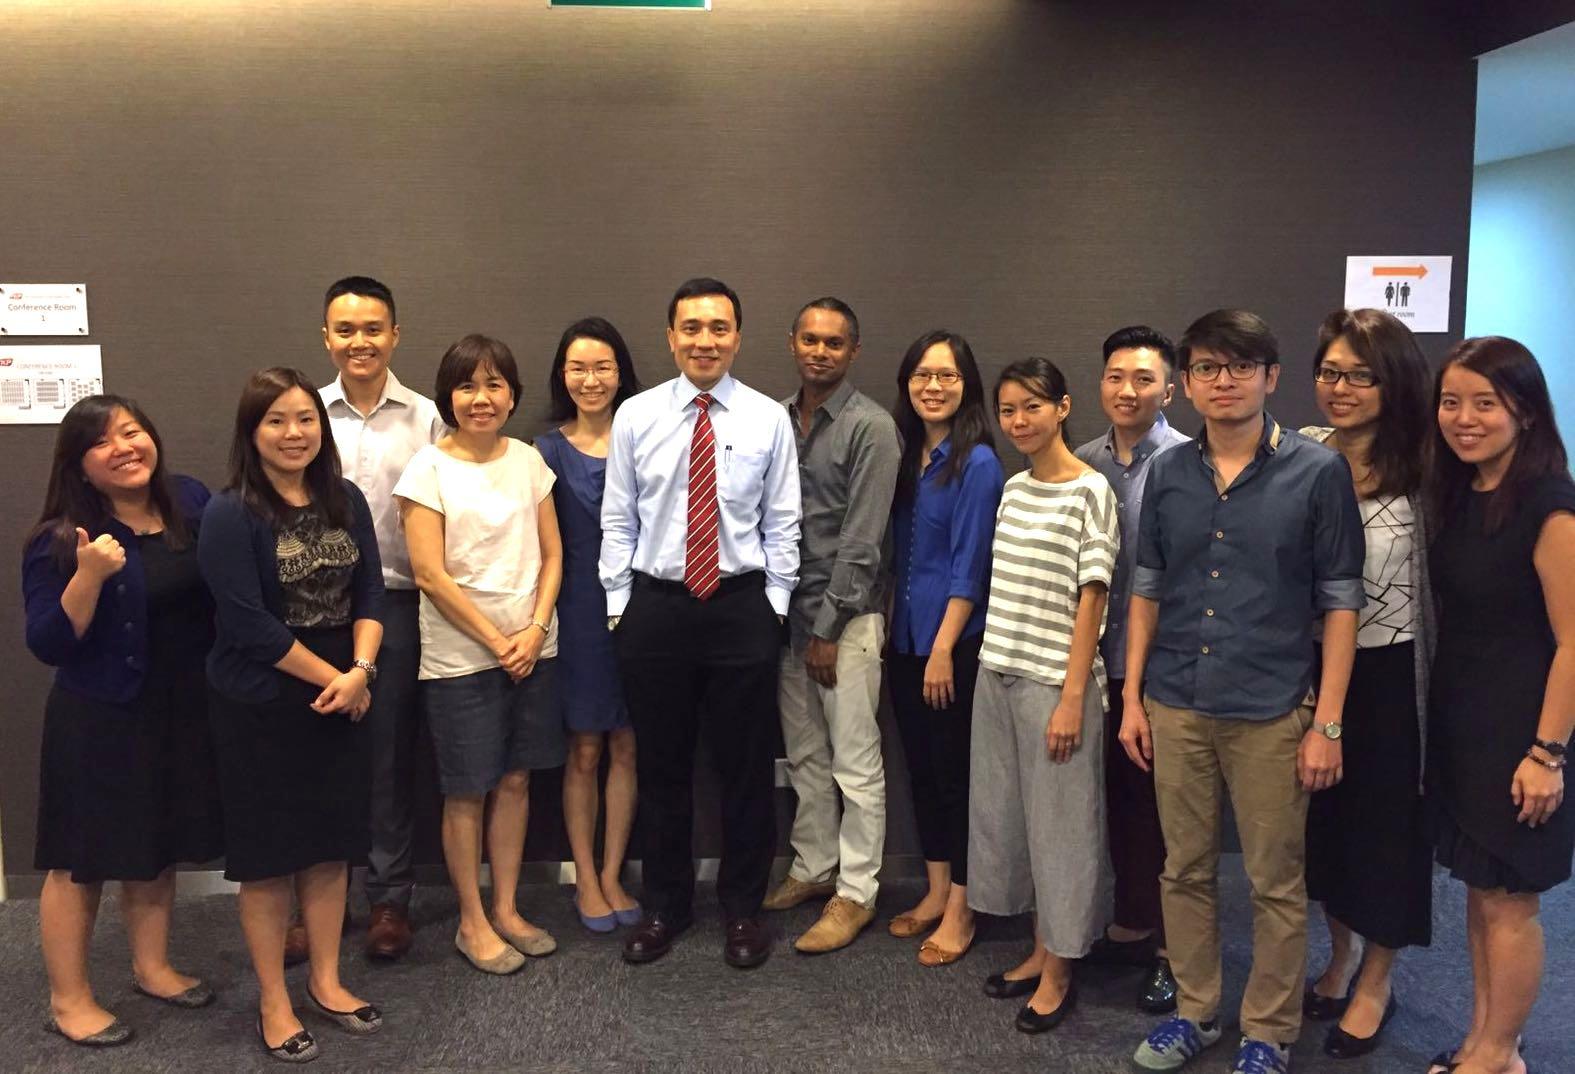 Affordable Braces Singapore - Singapore August Lecture 1